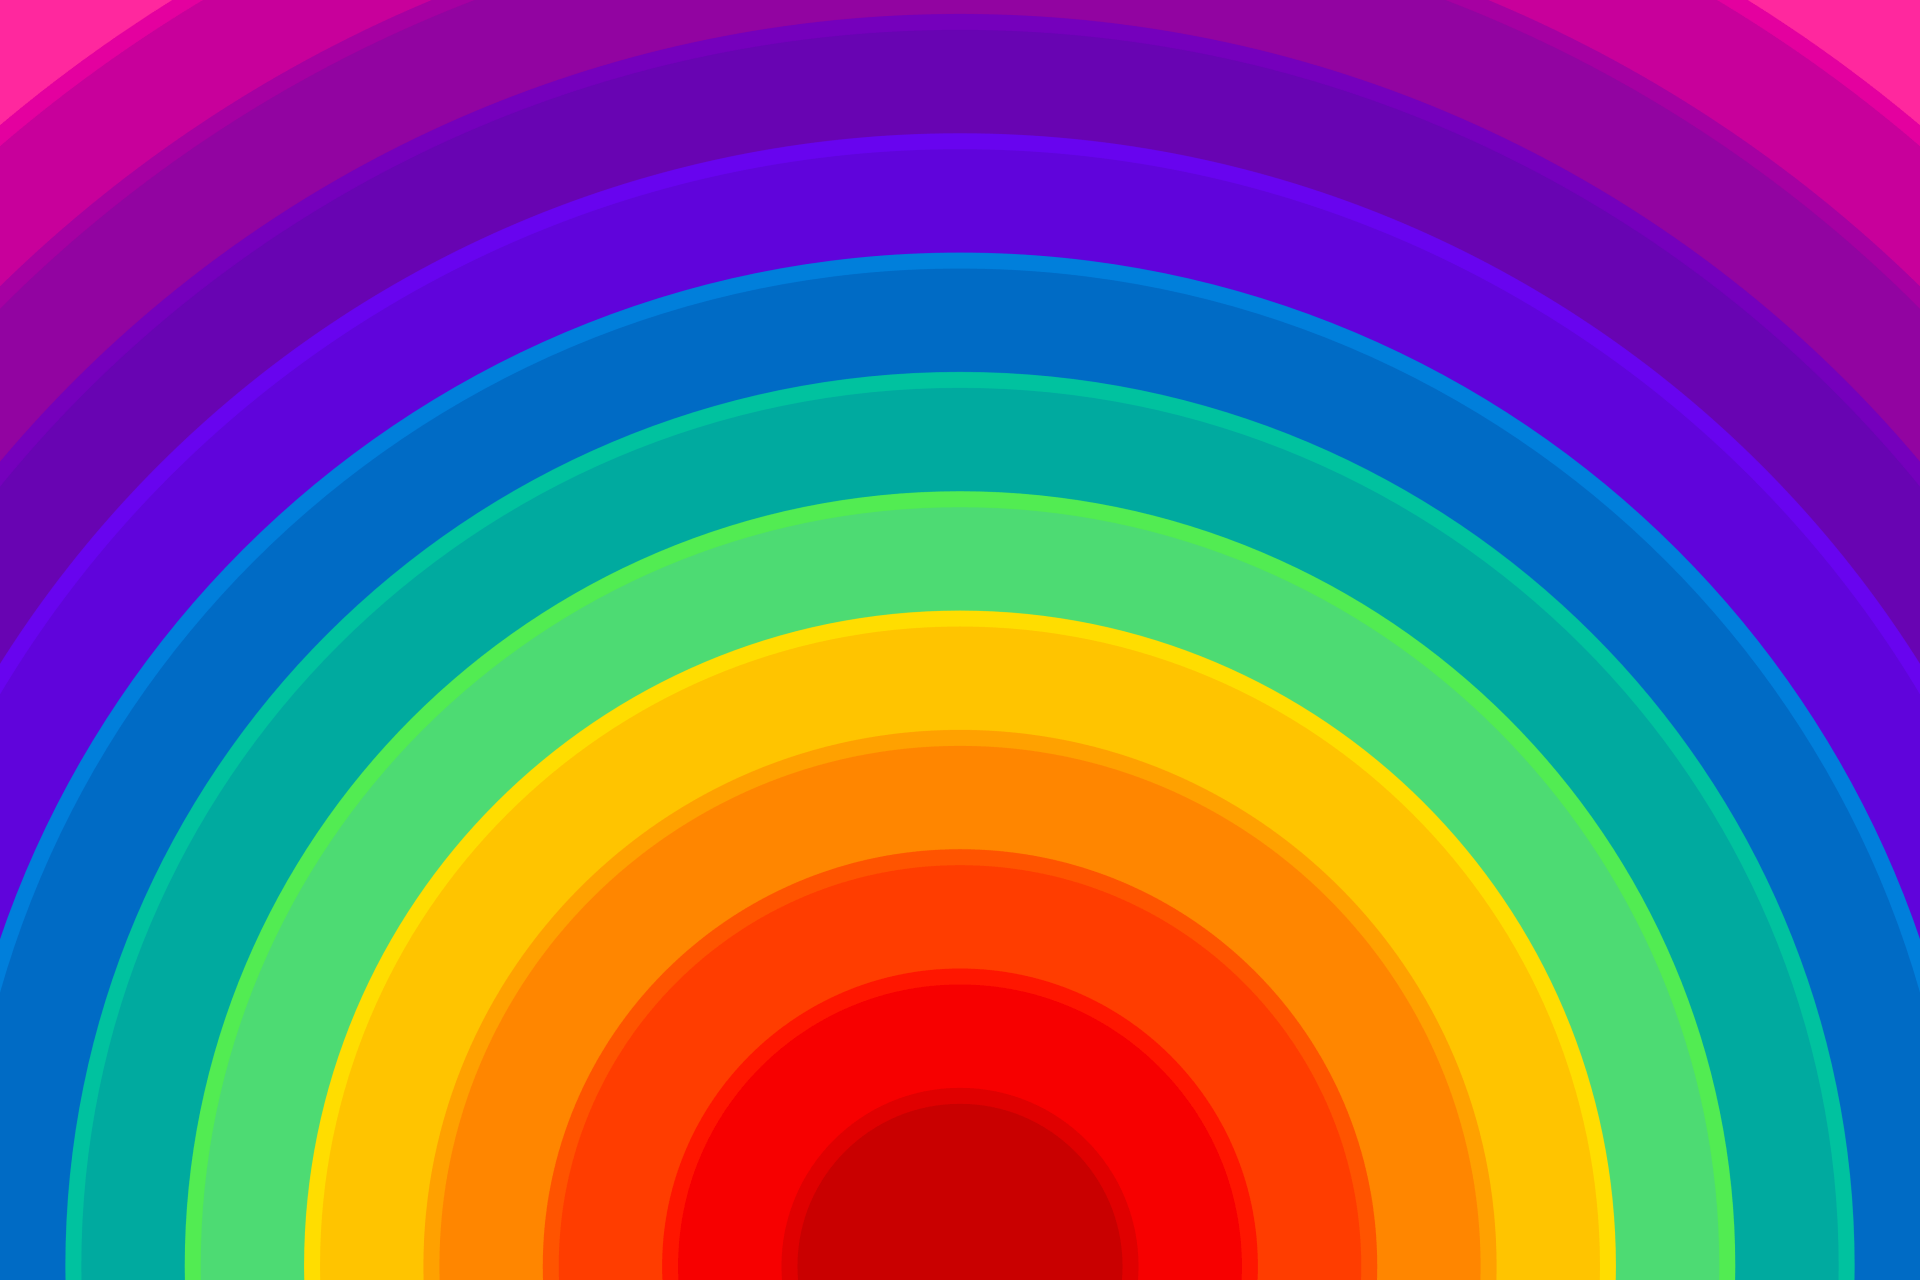 Girly Wallpaper Iphone X Digital Rainbow 6k Uhd Wallpaper